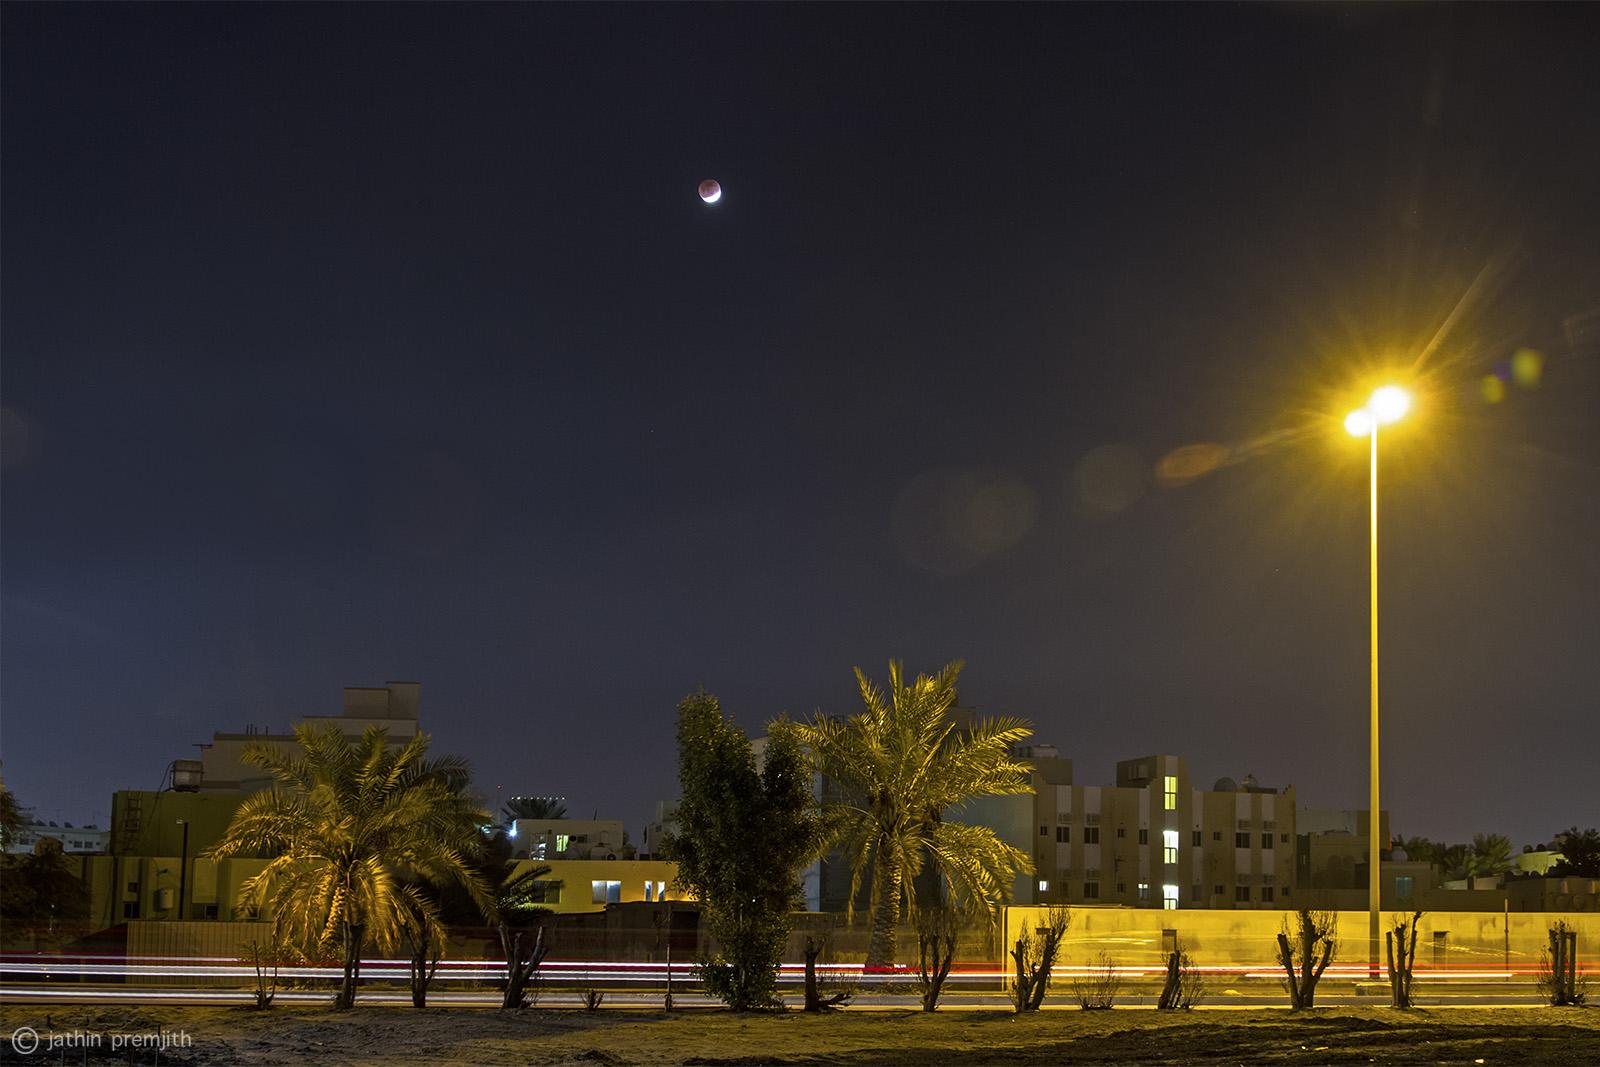 Lunar Eclipse in progress, 12th Dec, 2011